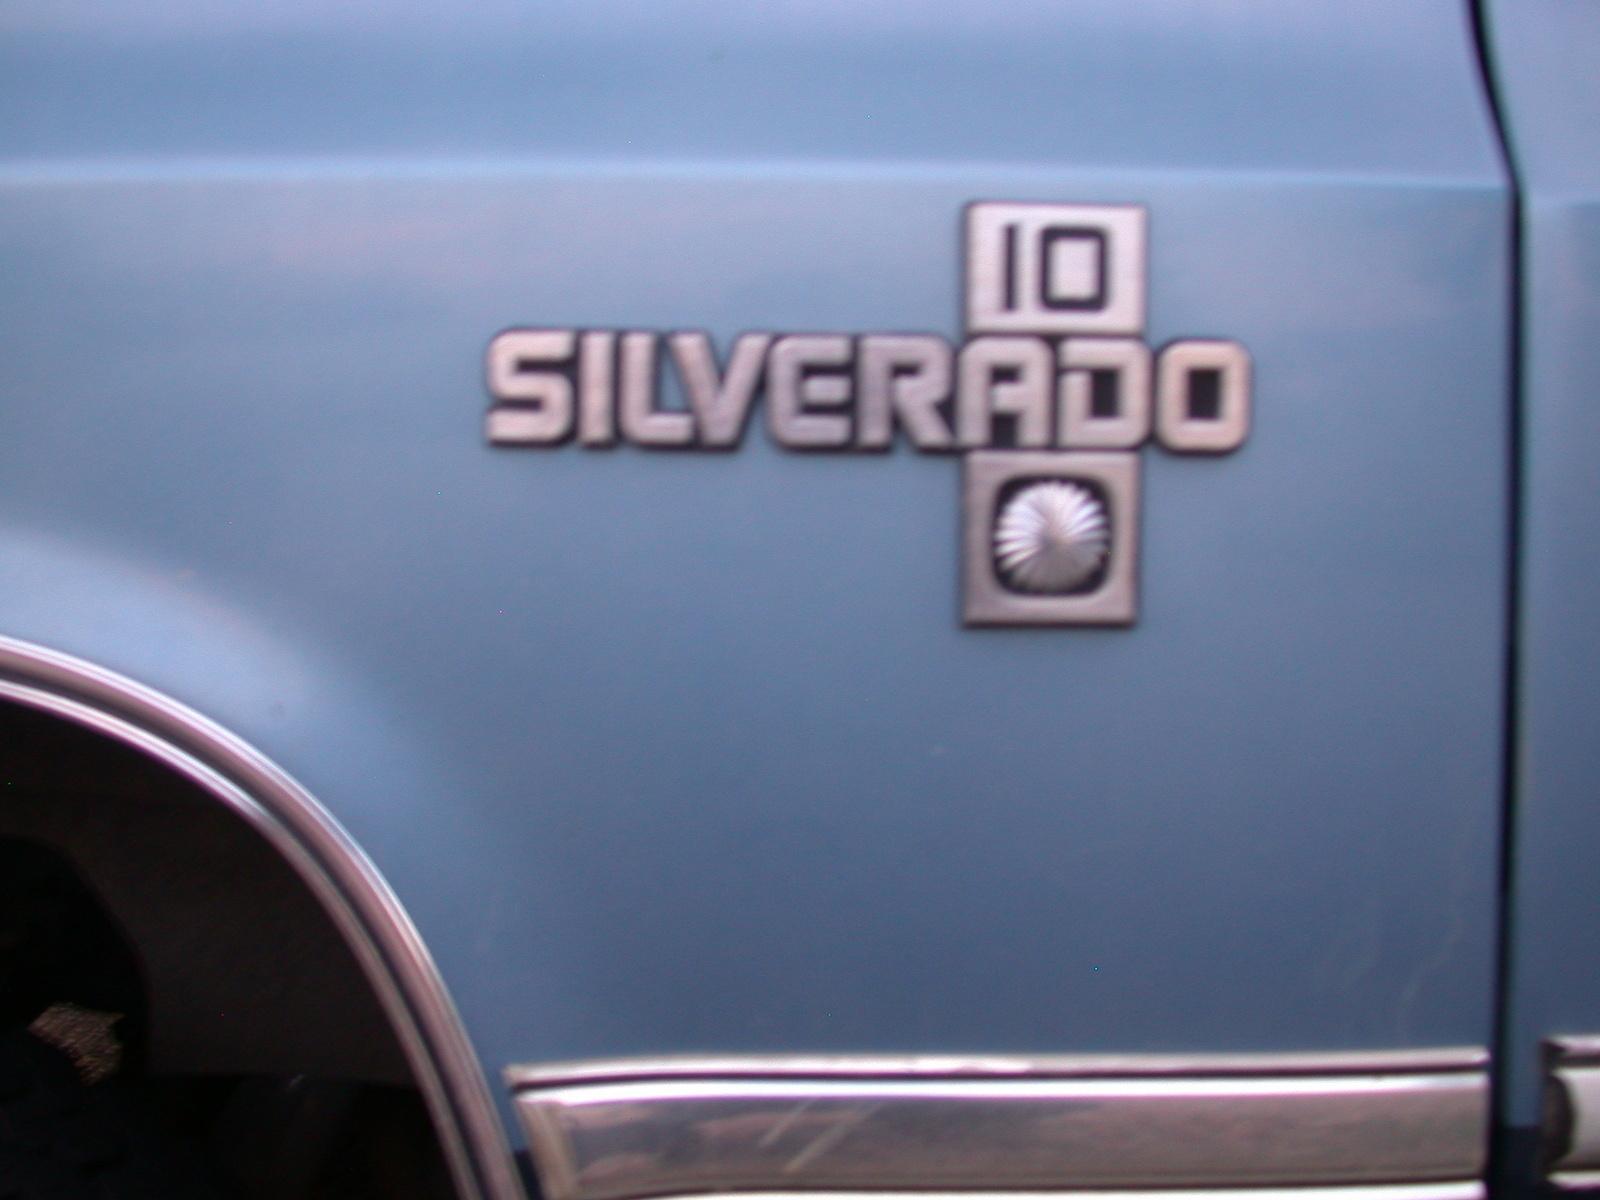 1987 Chevrolet Suburban - Overview - CarGurus